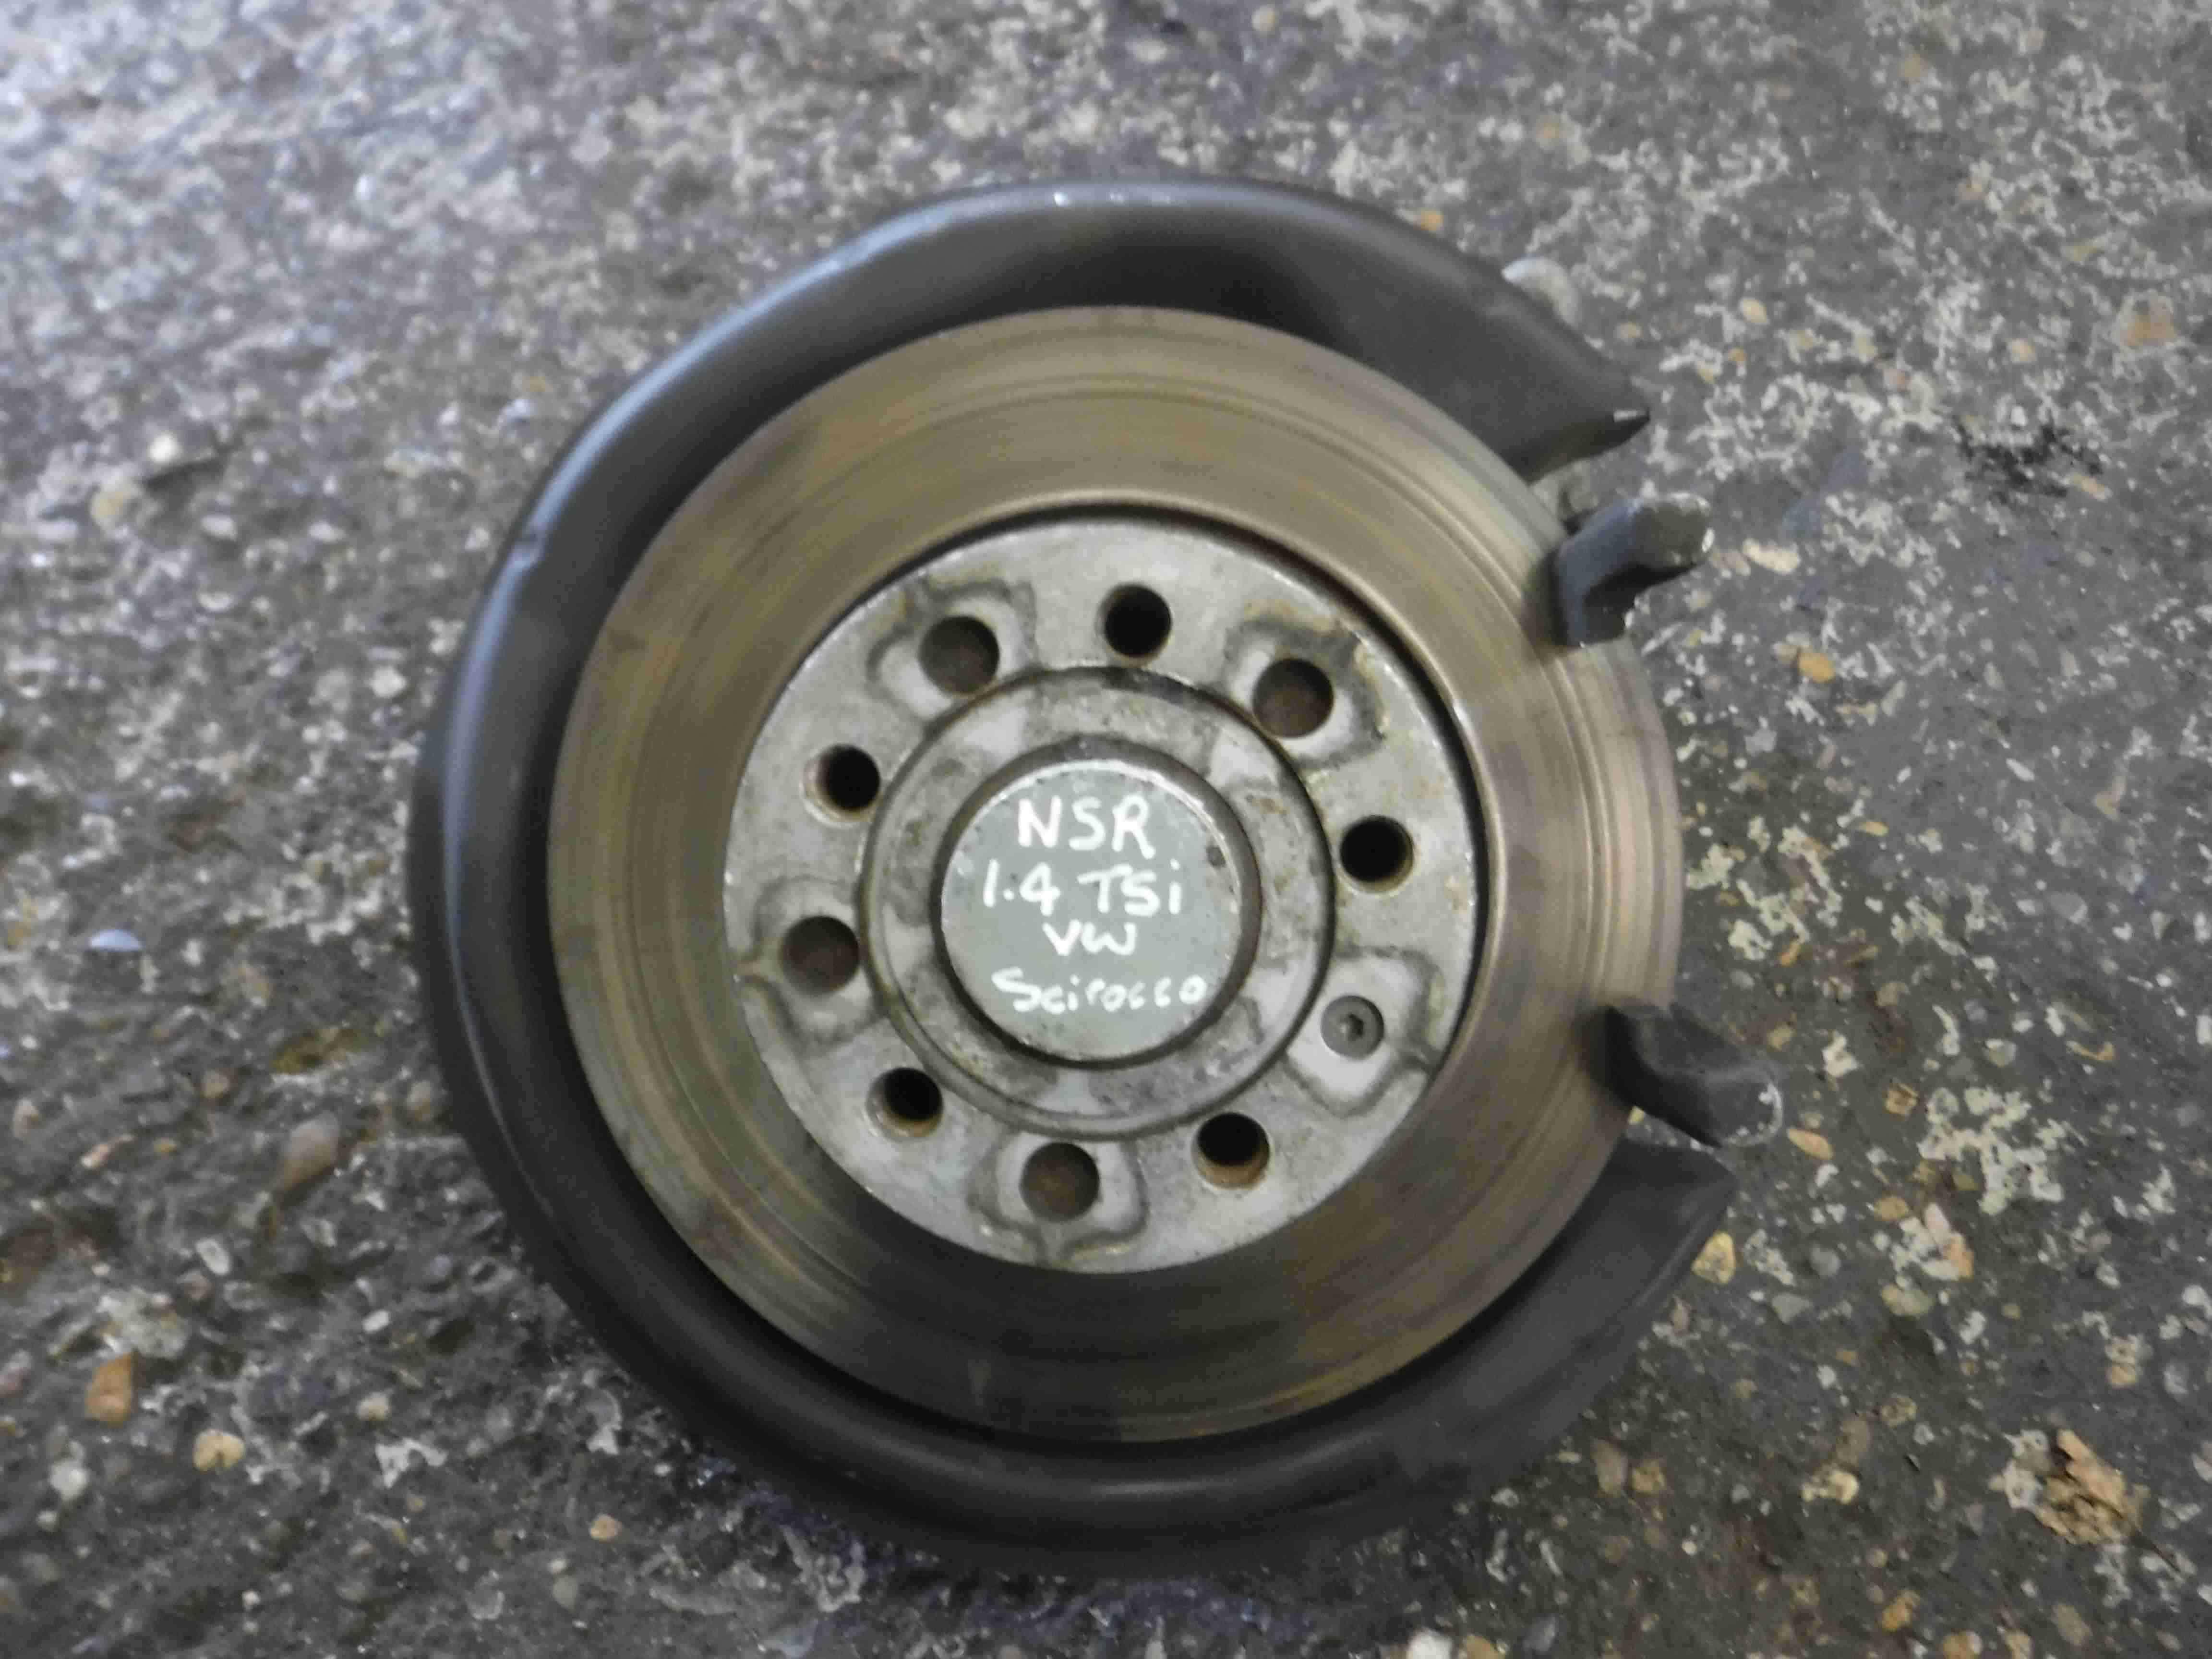 Volkswagen Scirocco 2008-2014  1.4 TSI Passenger NSR Rear Hub Disc Stub Axle